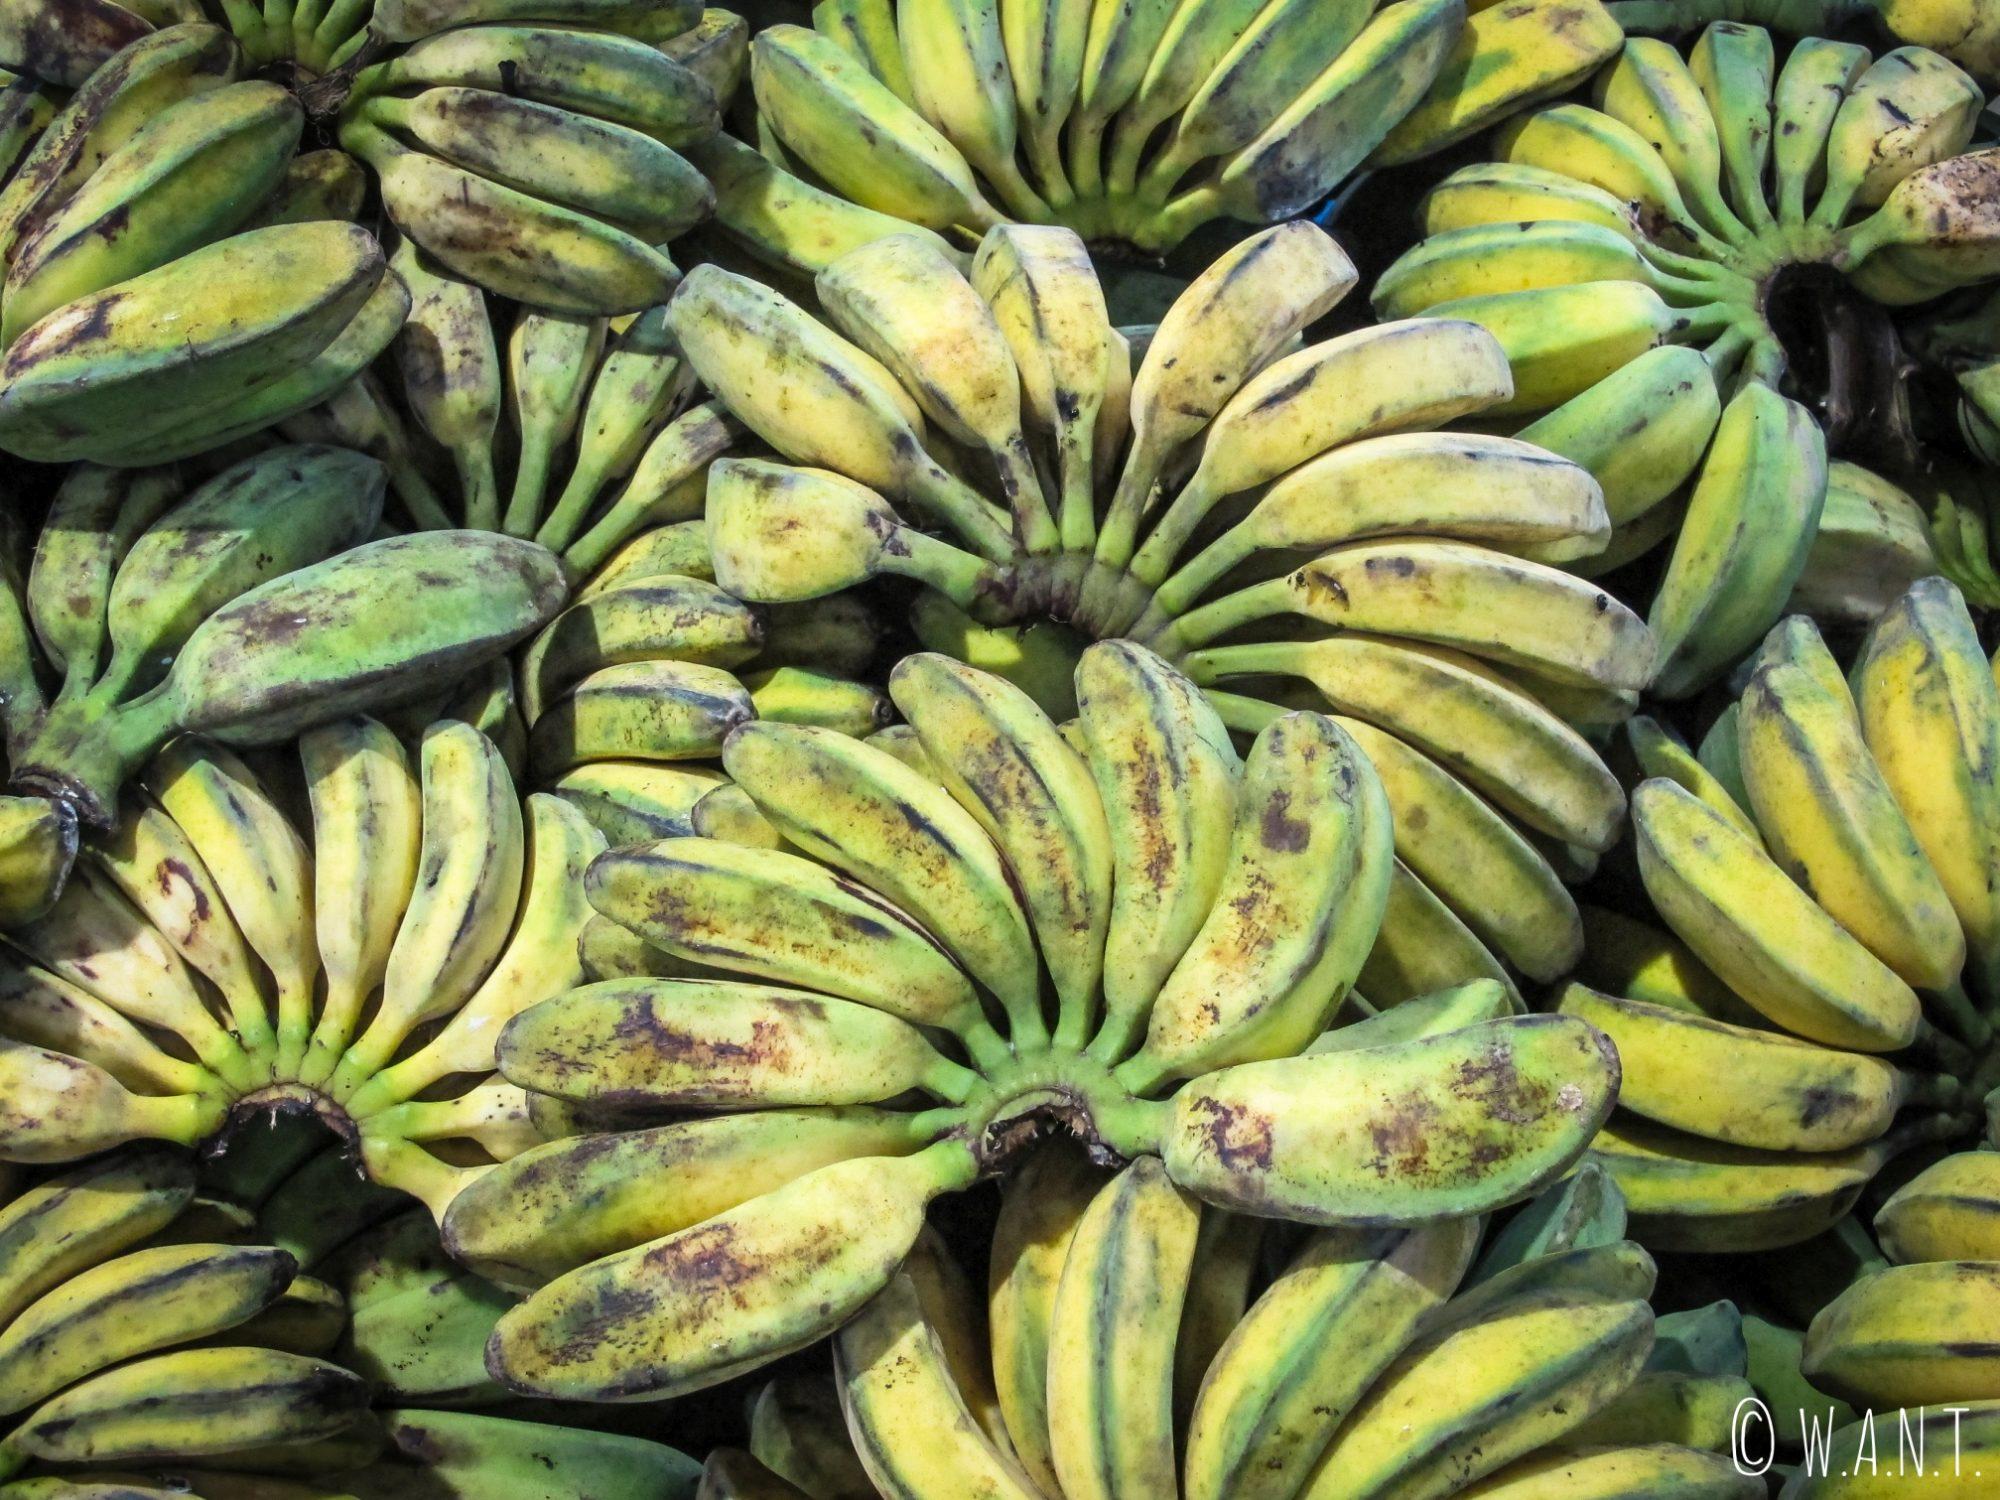 Bananes au marché Kianggeh de Bandar Seri Begawan